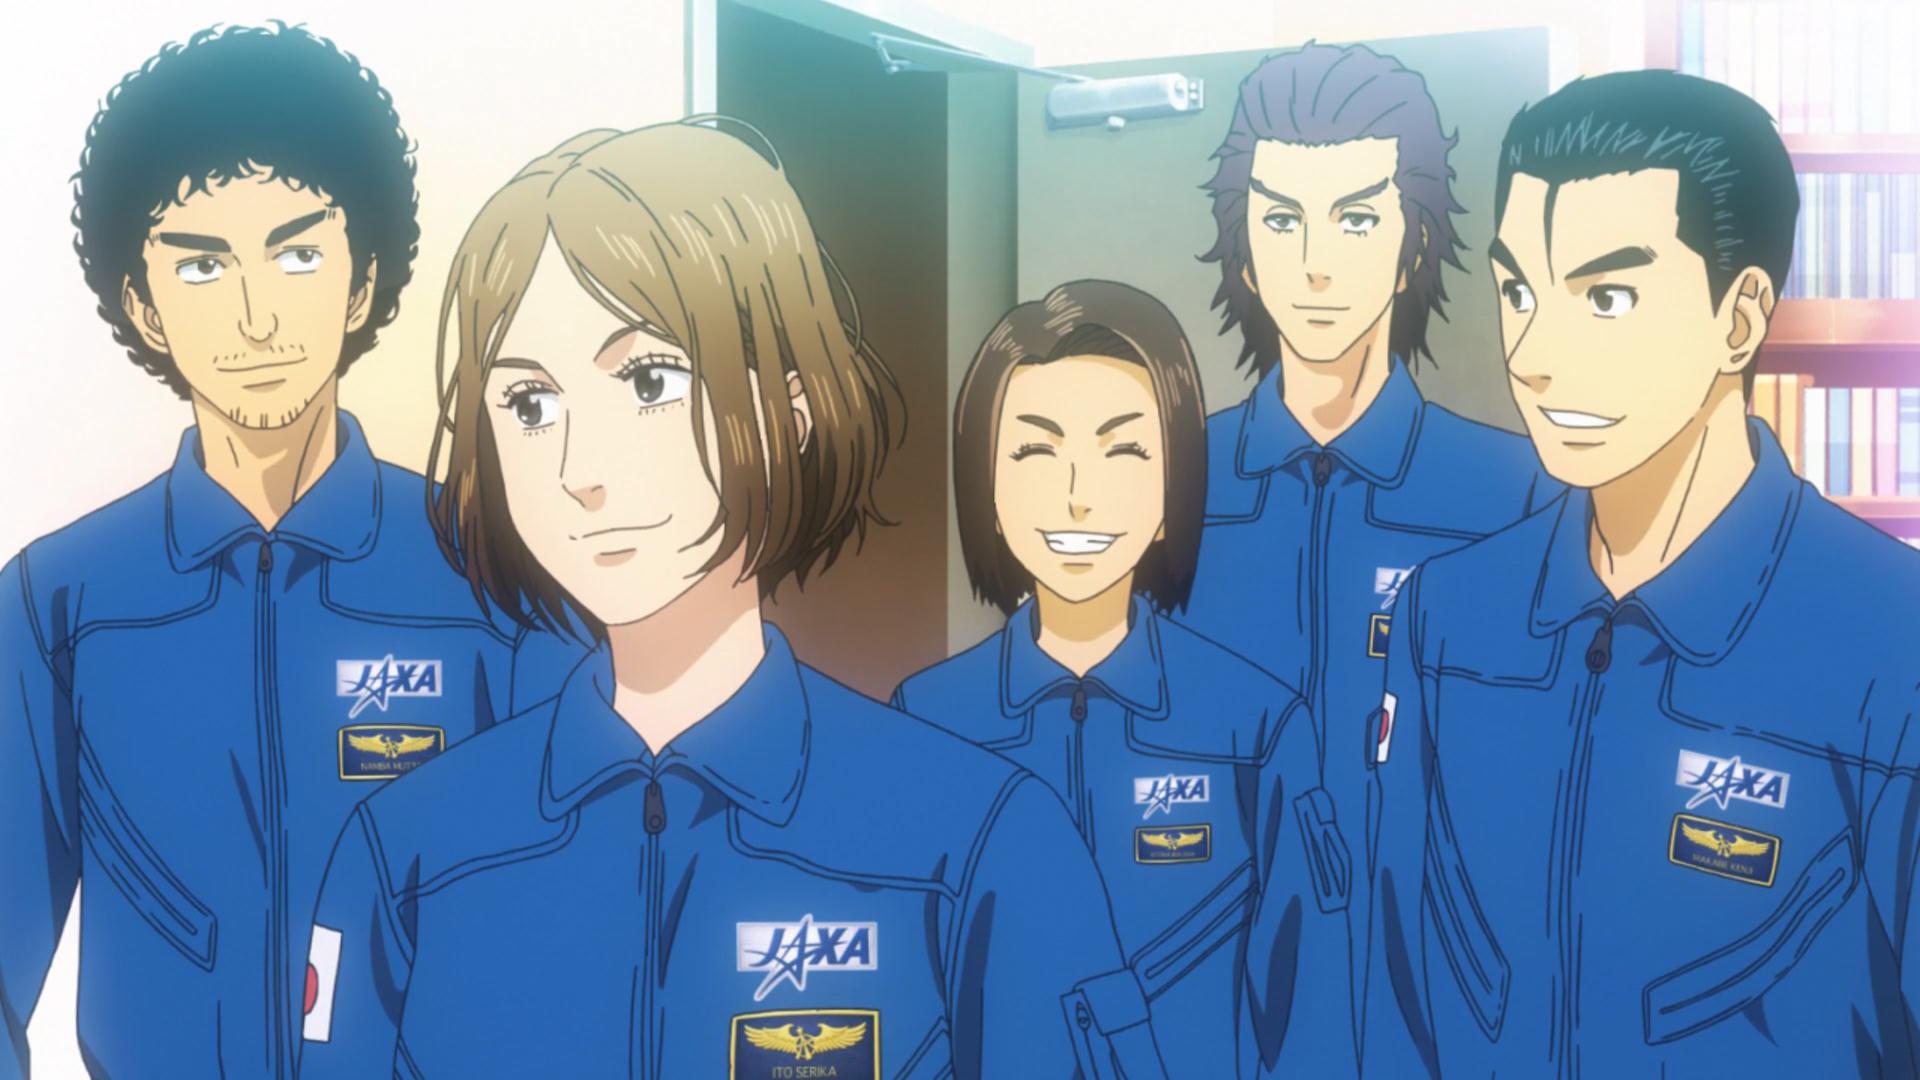 [ANIME/MANGA] Space Brothers (Uchuu Kyoudai) Mutta-Serika-Ena-Reiji-Kenji-Space-Brothers-uchuu-kyoudai-space-bros-34577294-1920-1080